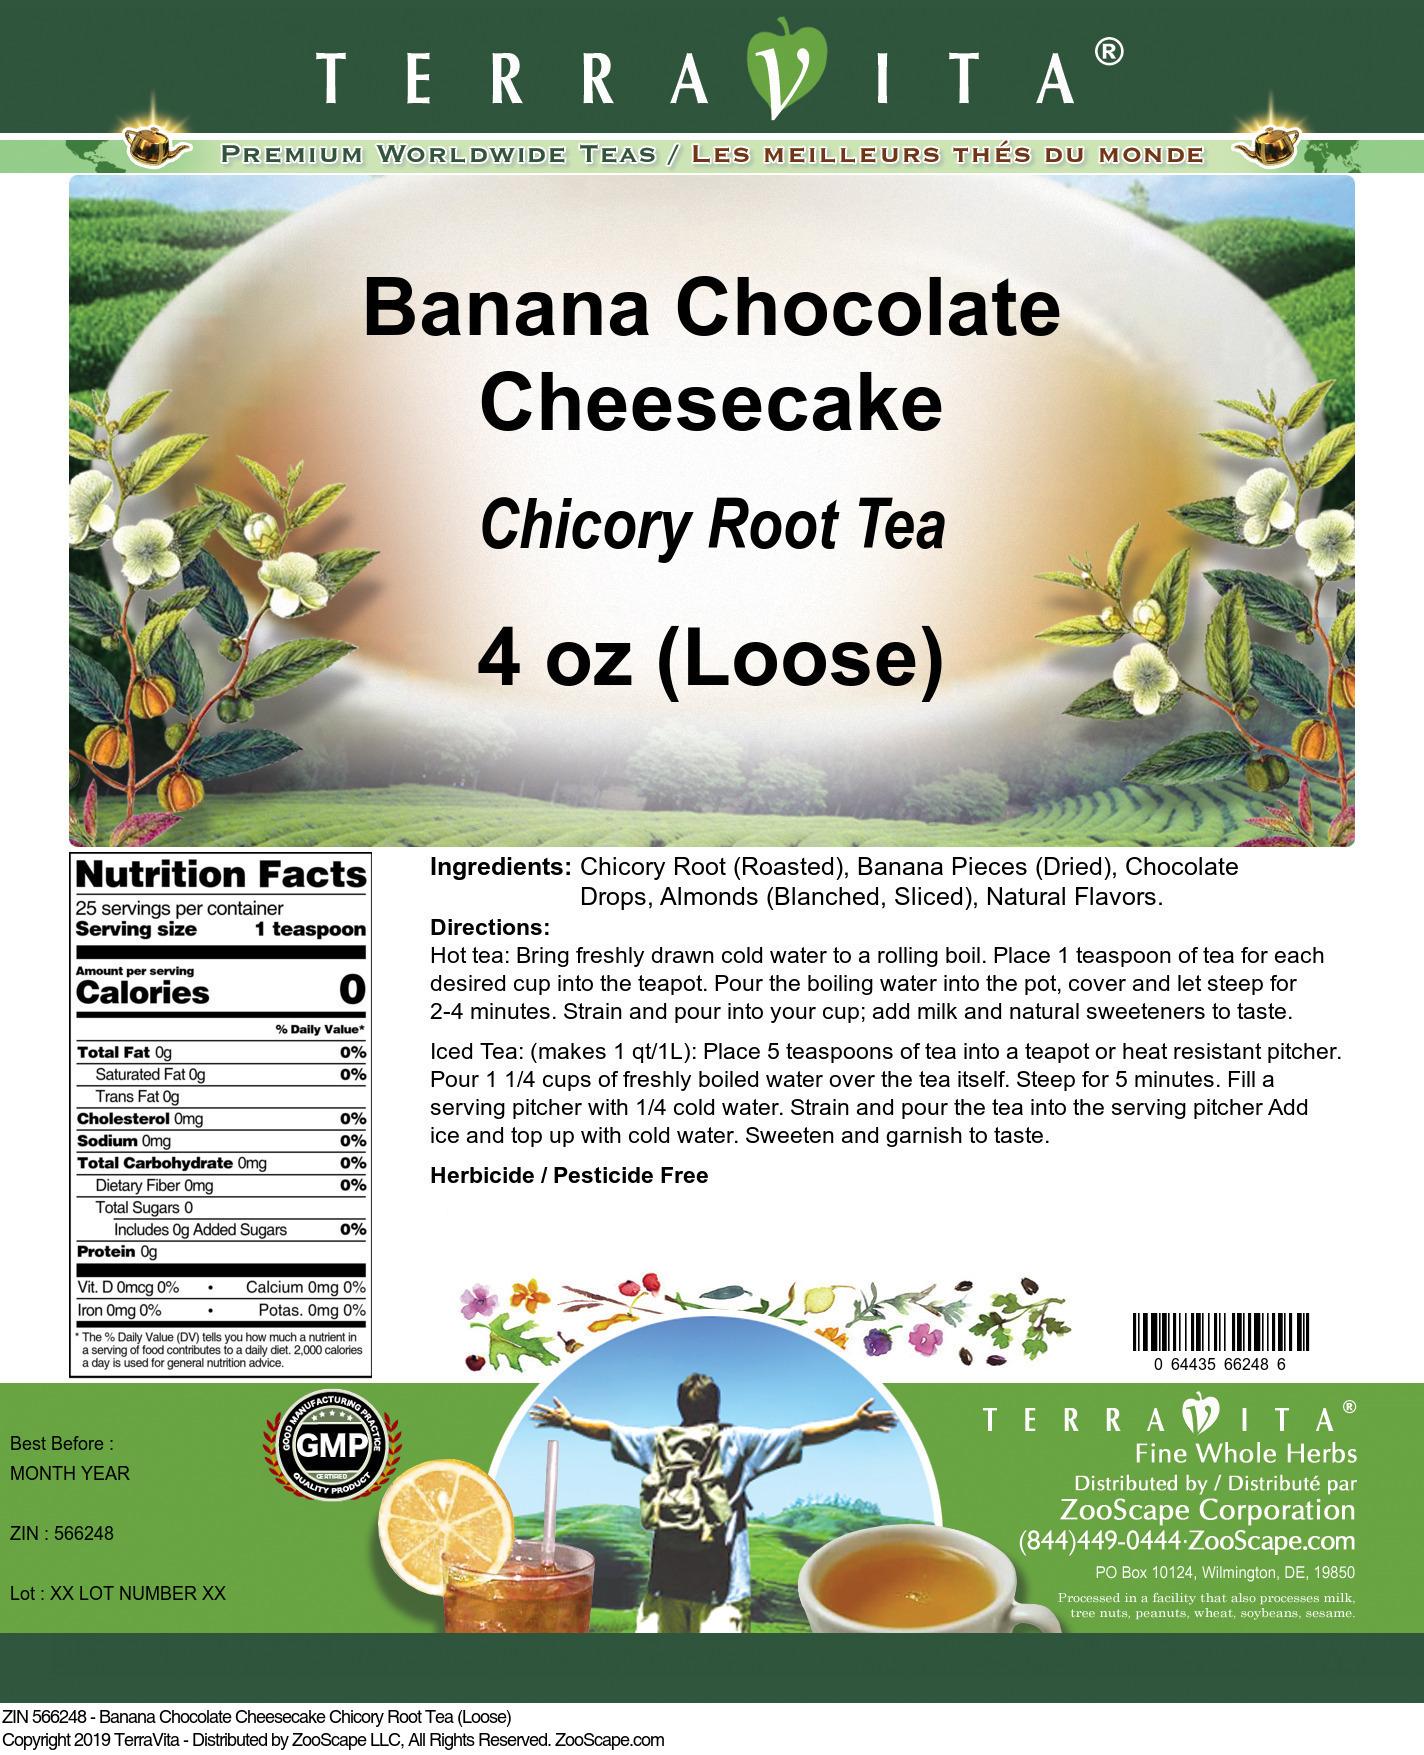 Banana Chocolate Cheesecake Chicory Root Tea (Loose)